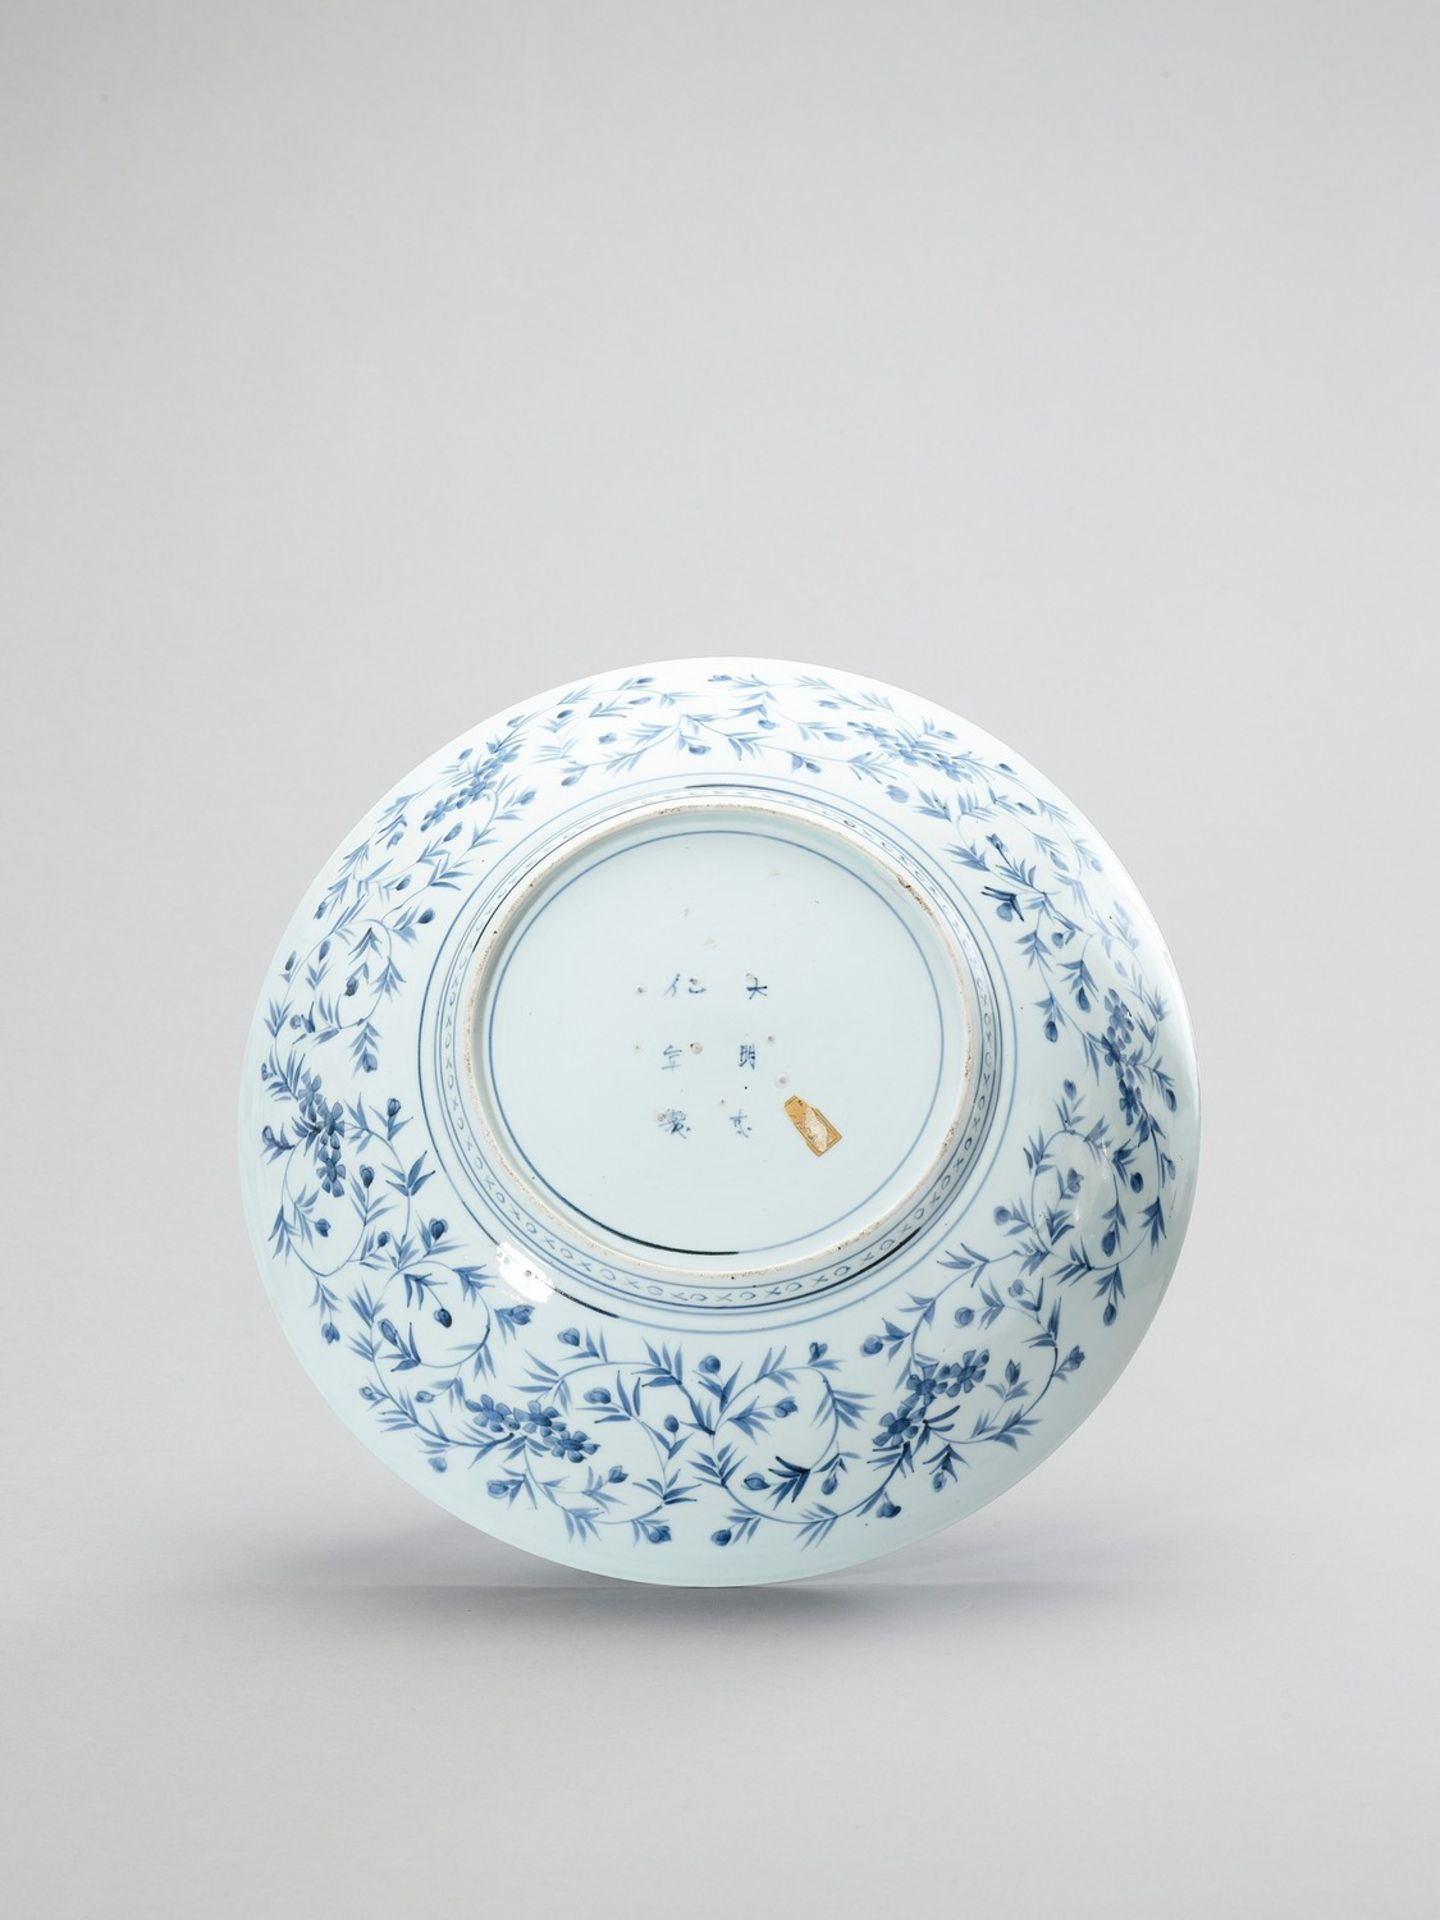 A BLUE AND WHITE ARITA PORCELAIN CHARGER - Bild 3 aus 5